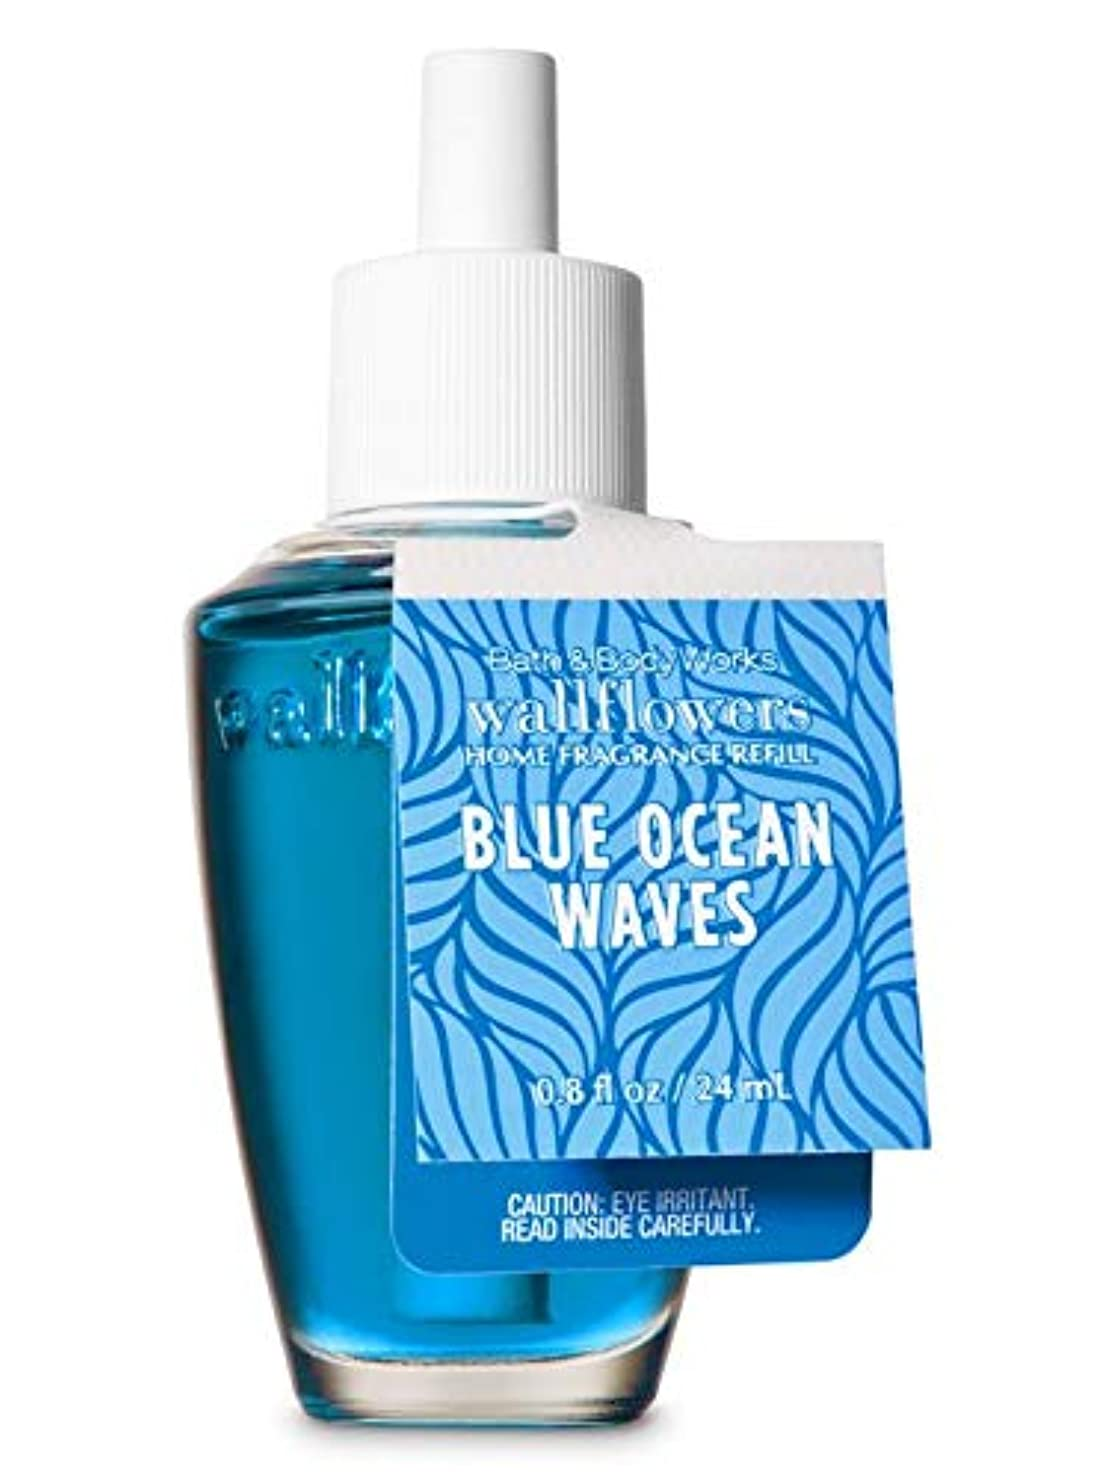 【Bath&Body Works/バス&ボディワークス】 ルームフレグランス 詰替えリフィル ブルーオーシャンウェーブ Wallflowers Home Fragrance Refill Blue Ocean Waves [並行輸入品]